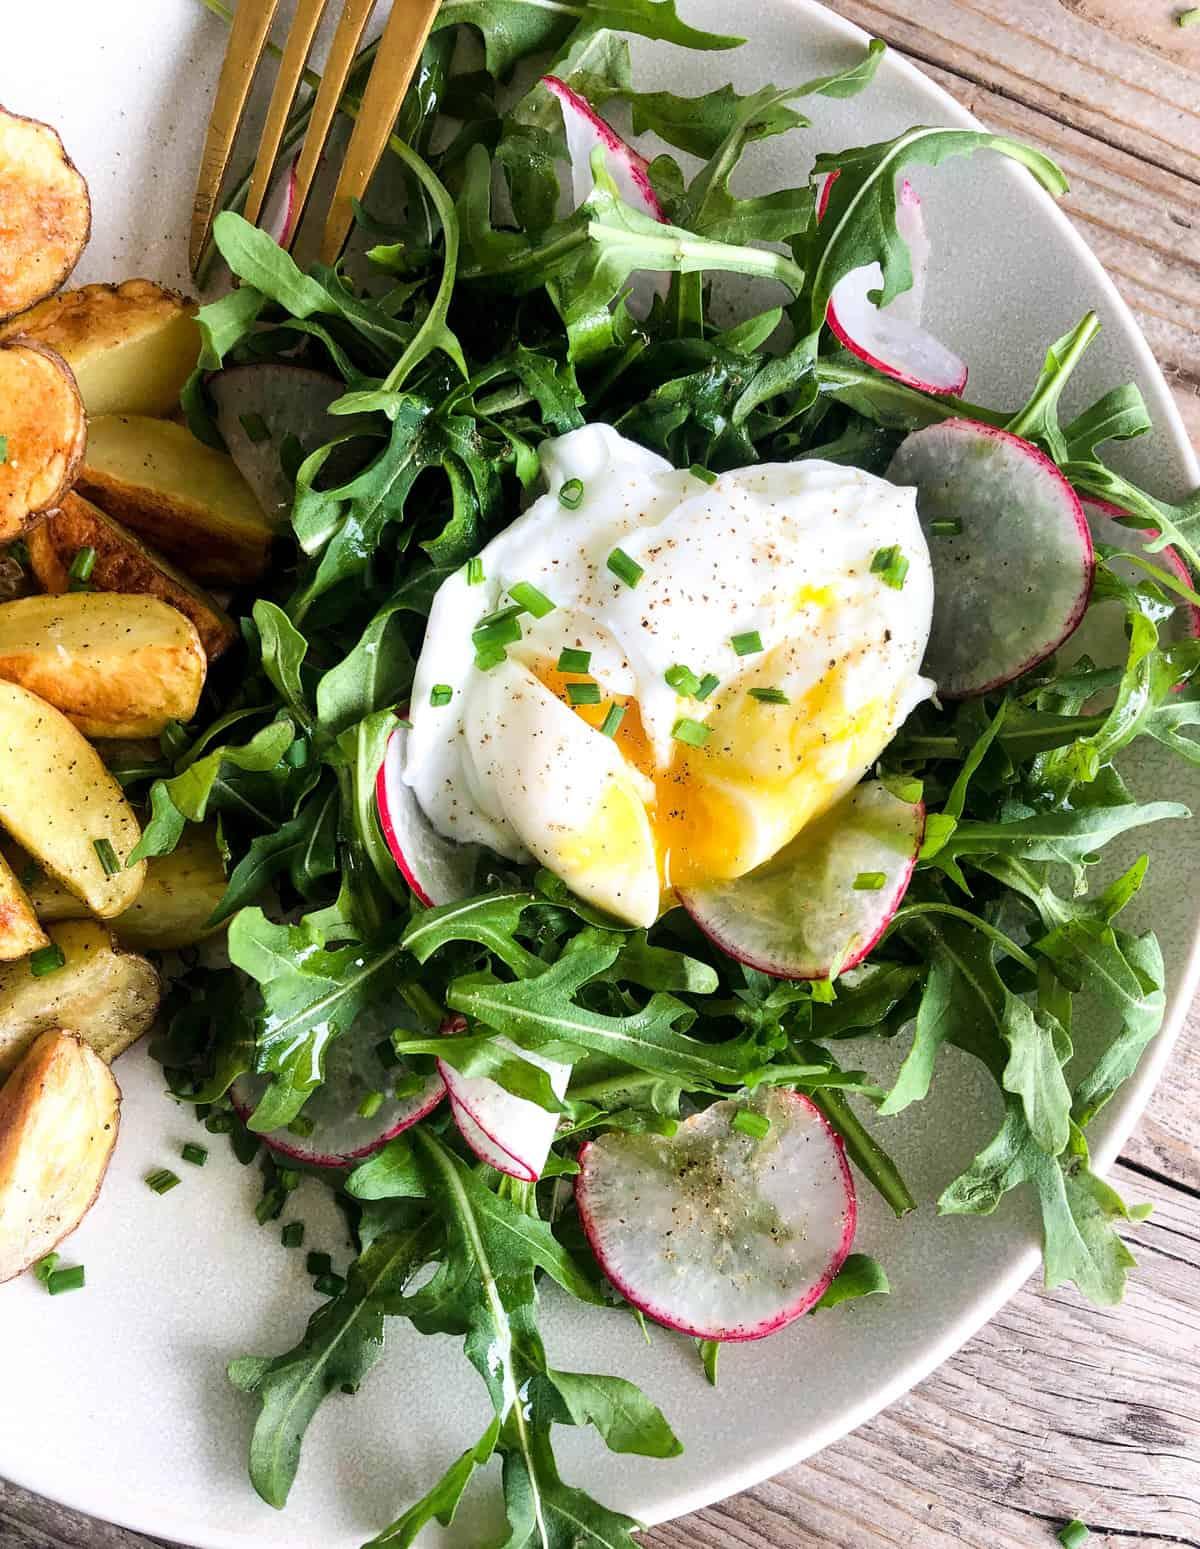 Arugula Salad with Poached Egg